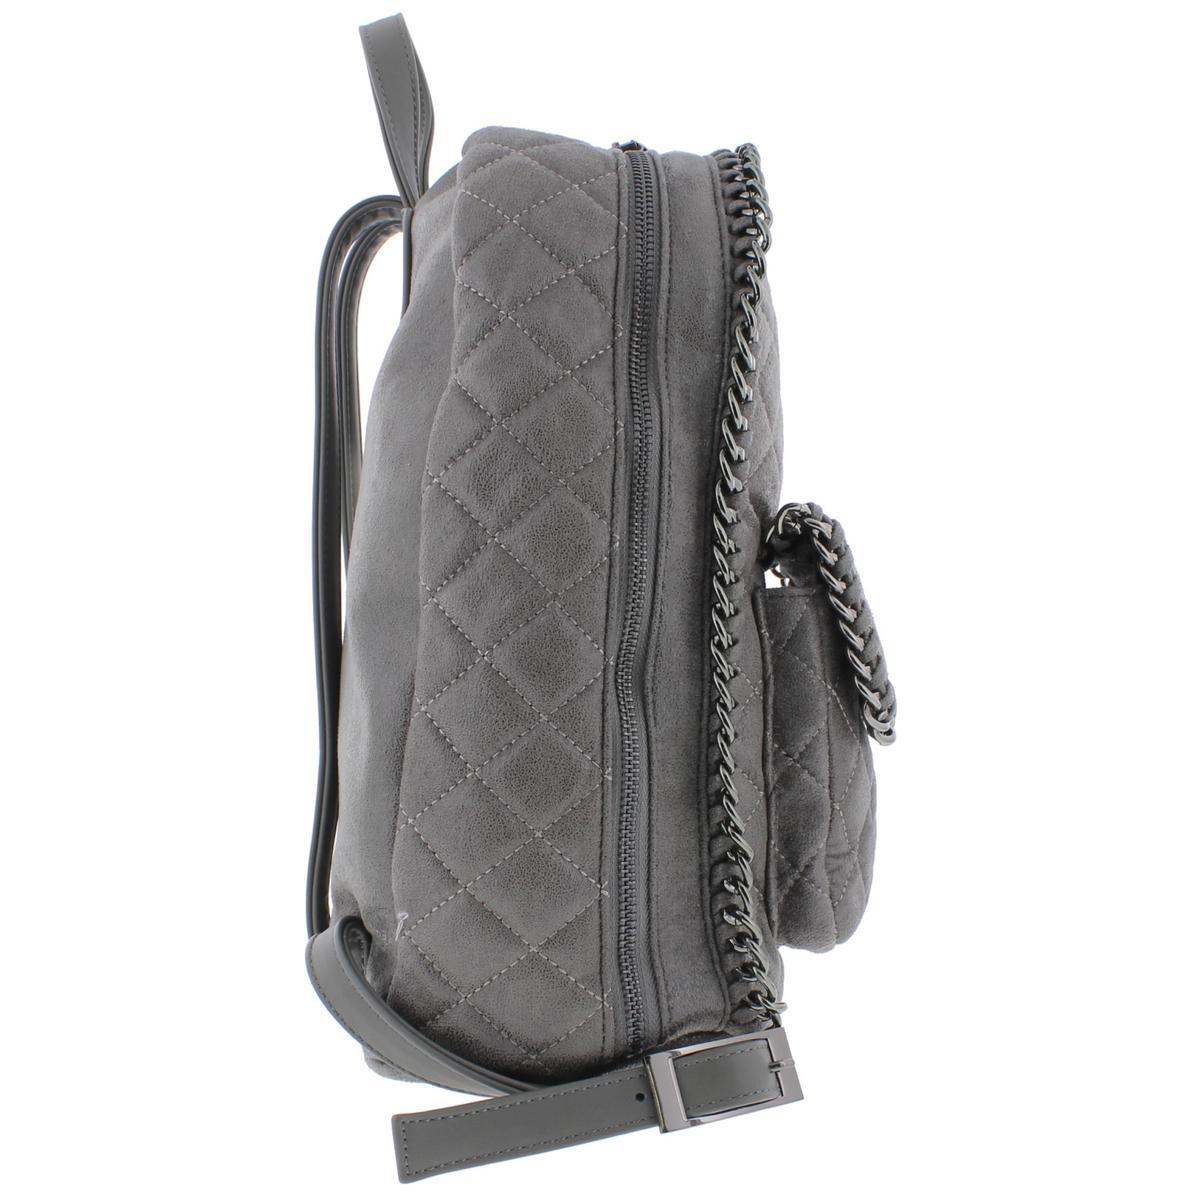 Urban-Expressions-Womens-Caleb-Vegan-Leather-Chain-Trim-Backpack-Purse-BHFO-7489 thumbnail 6